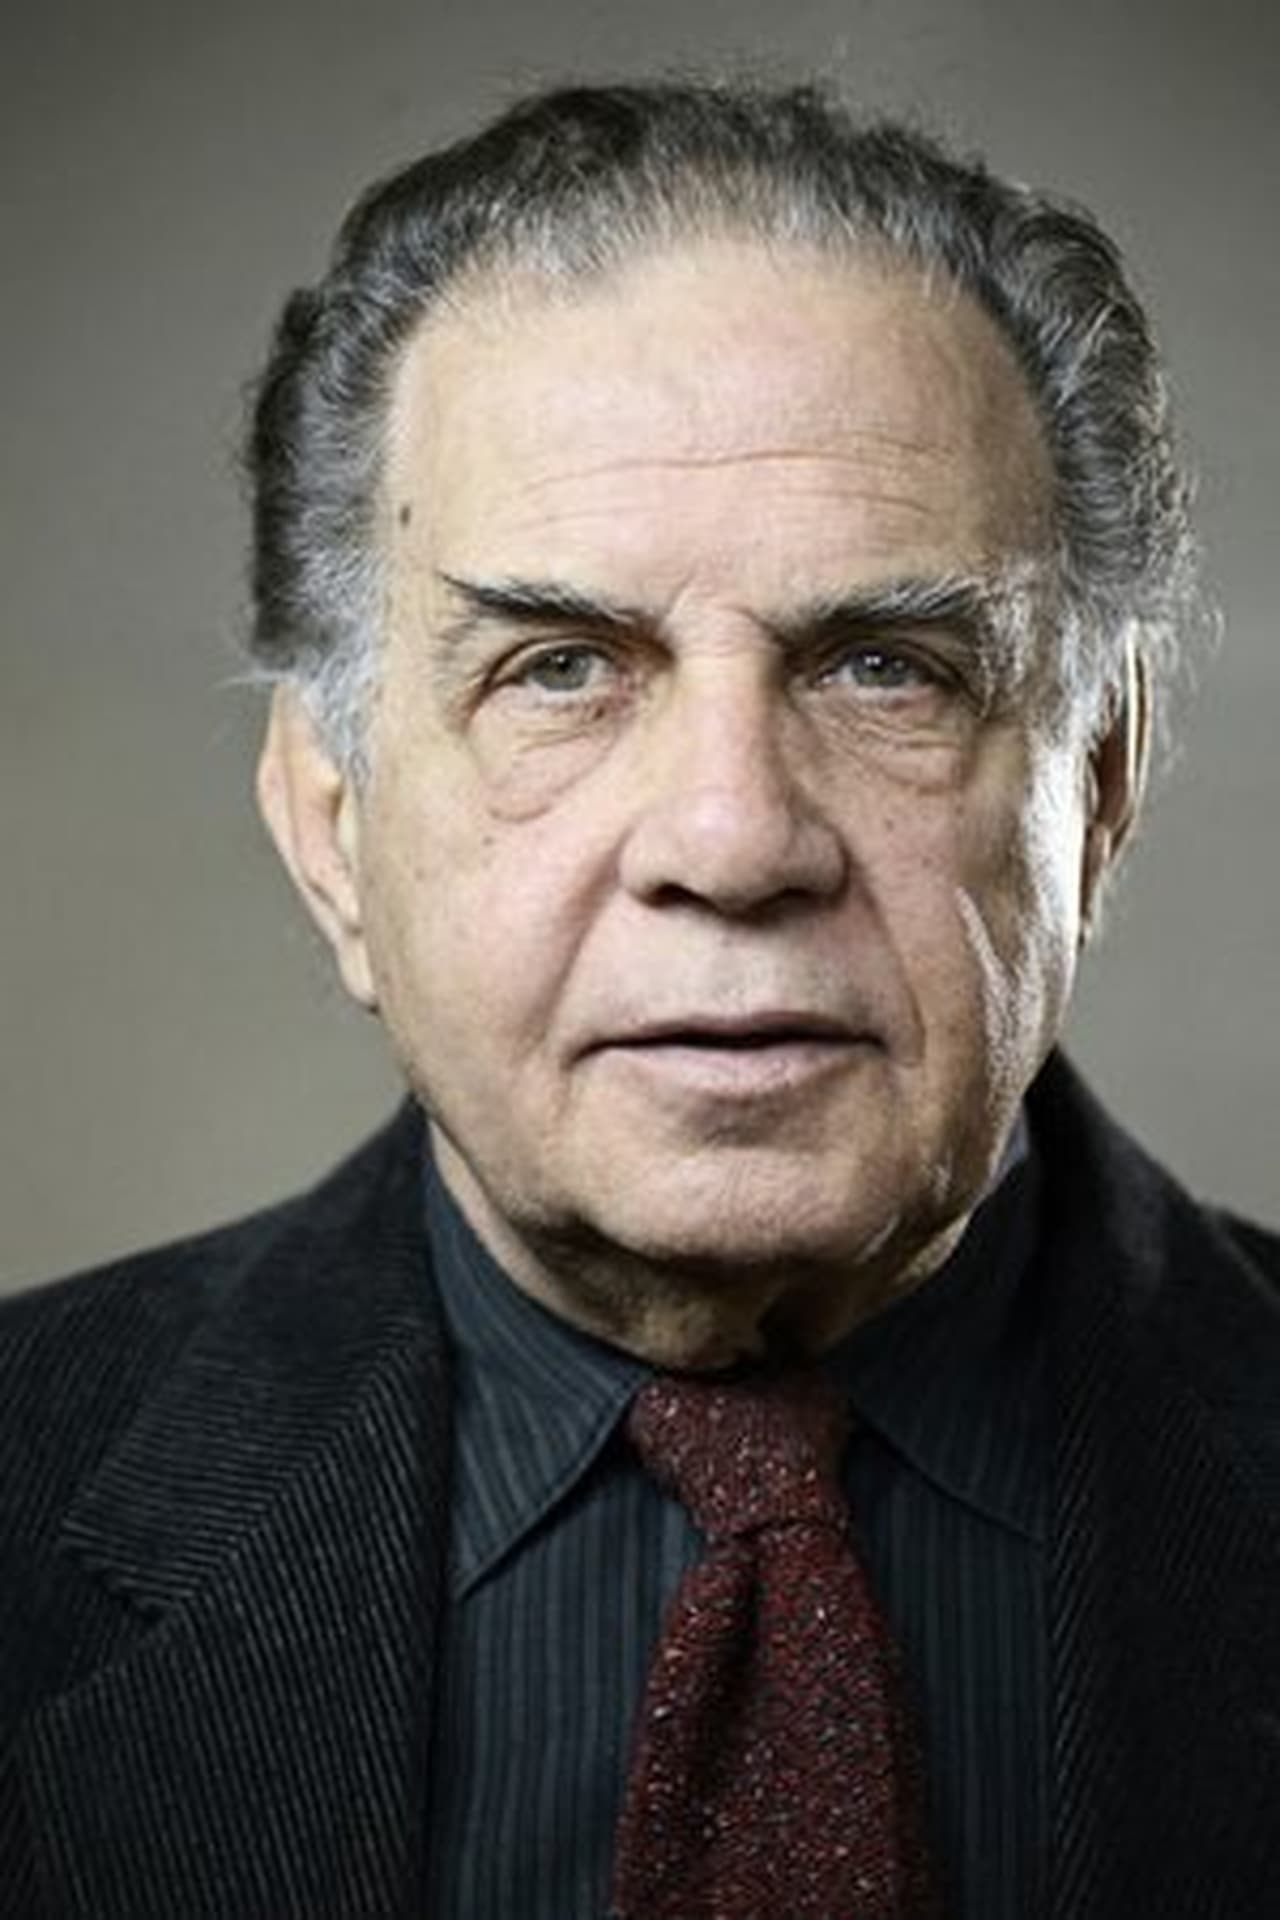 Rodolfo Baldini